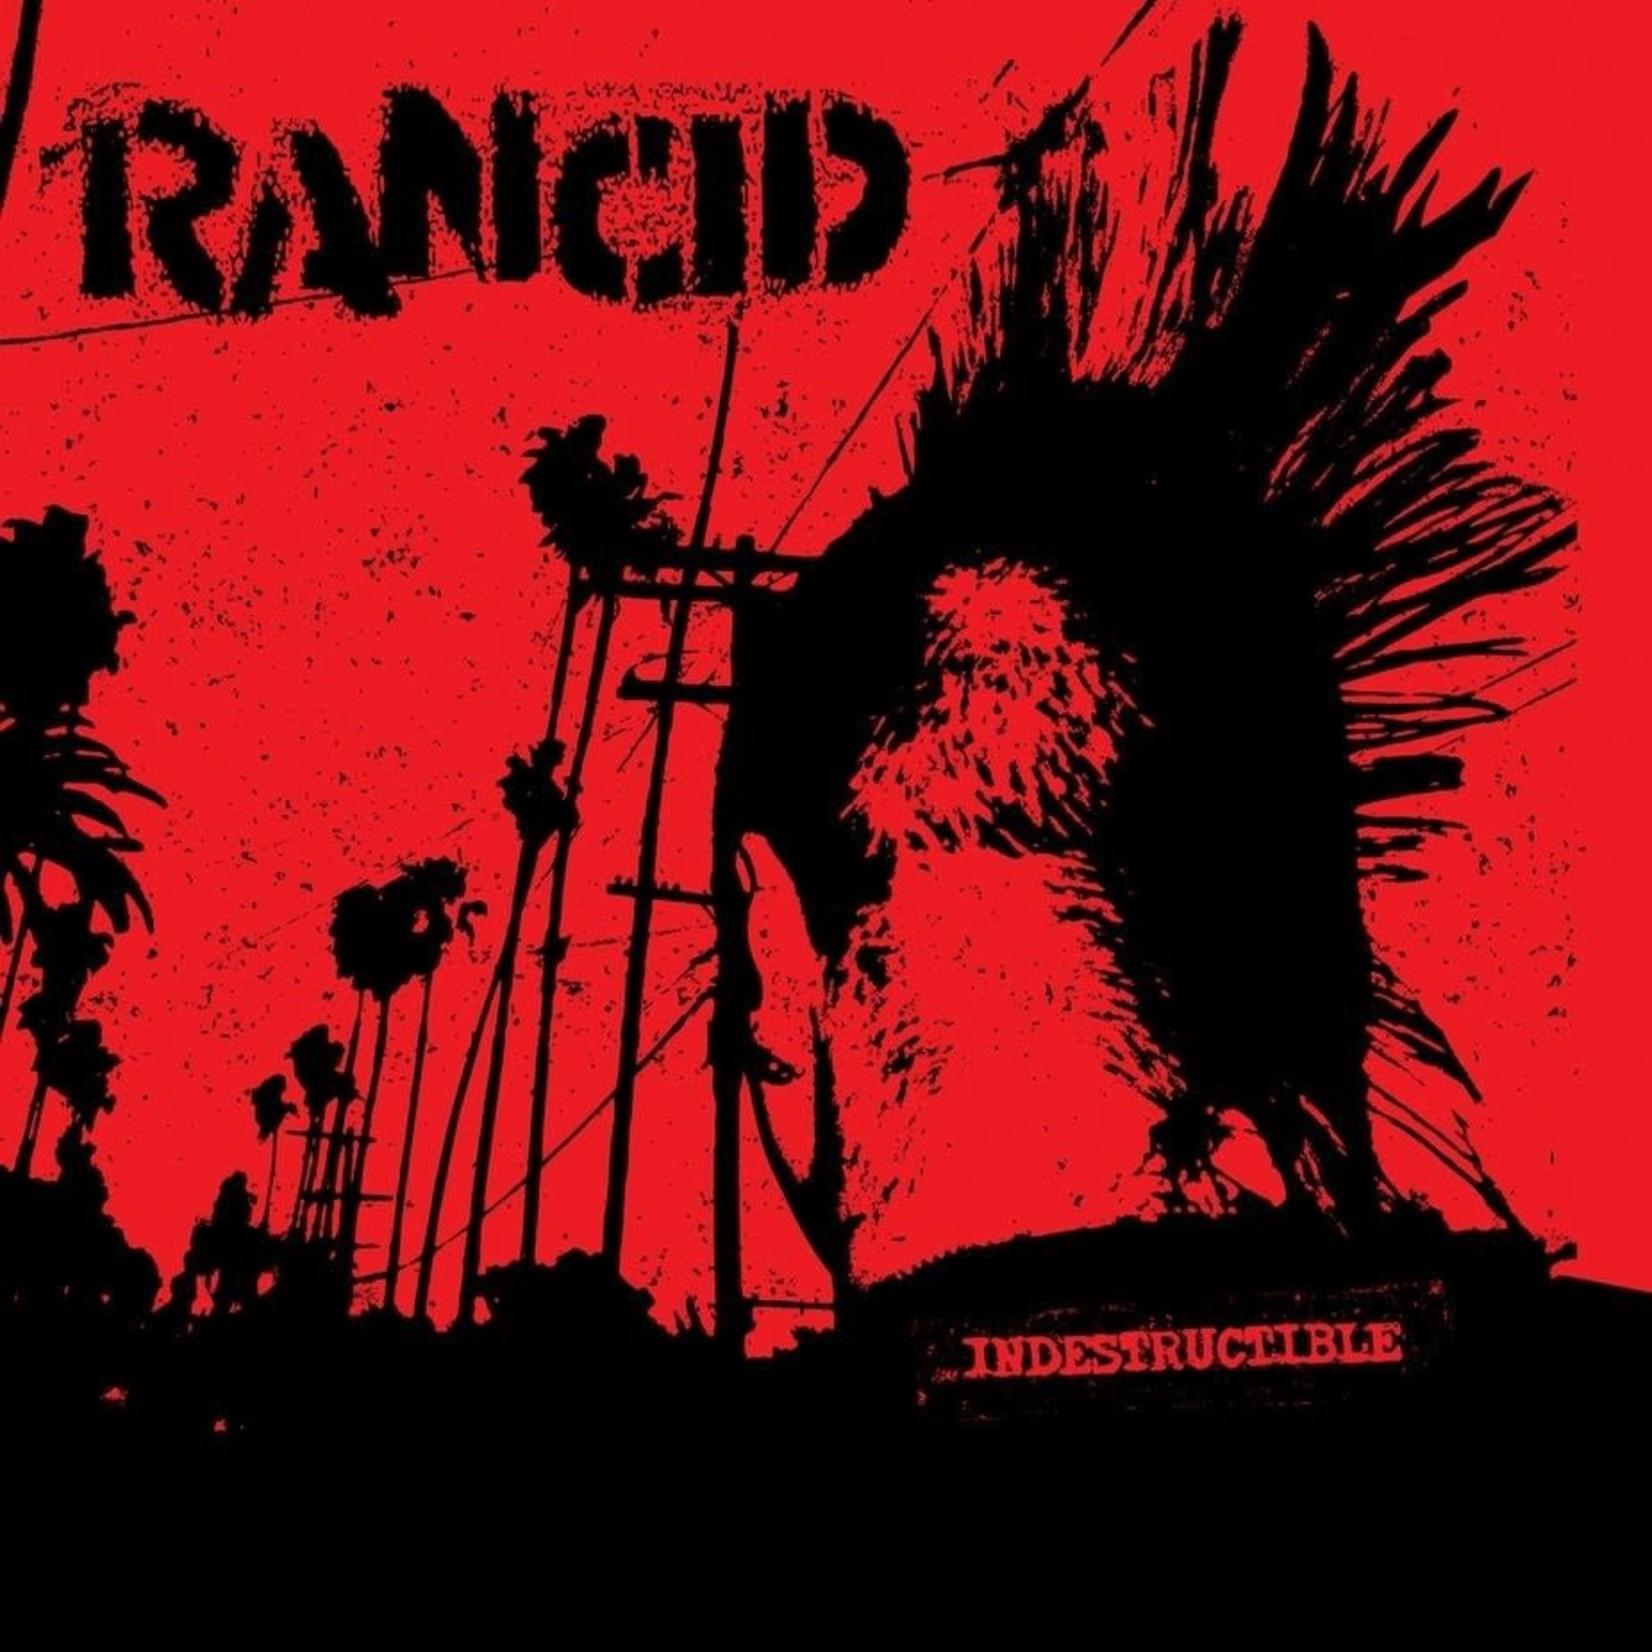 [New] Rancid: Indestructible (2LP)